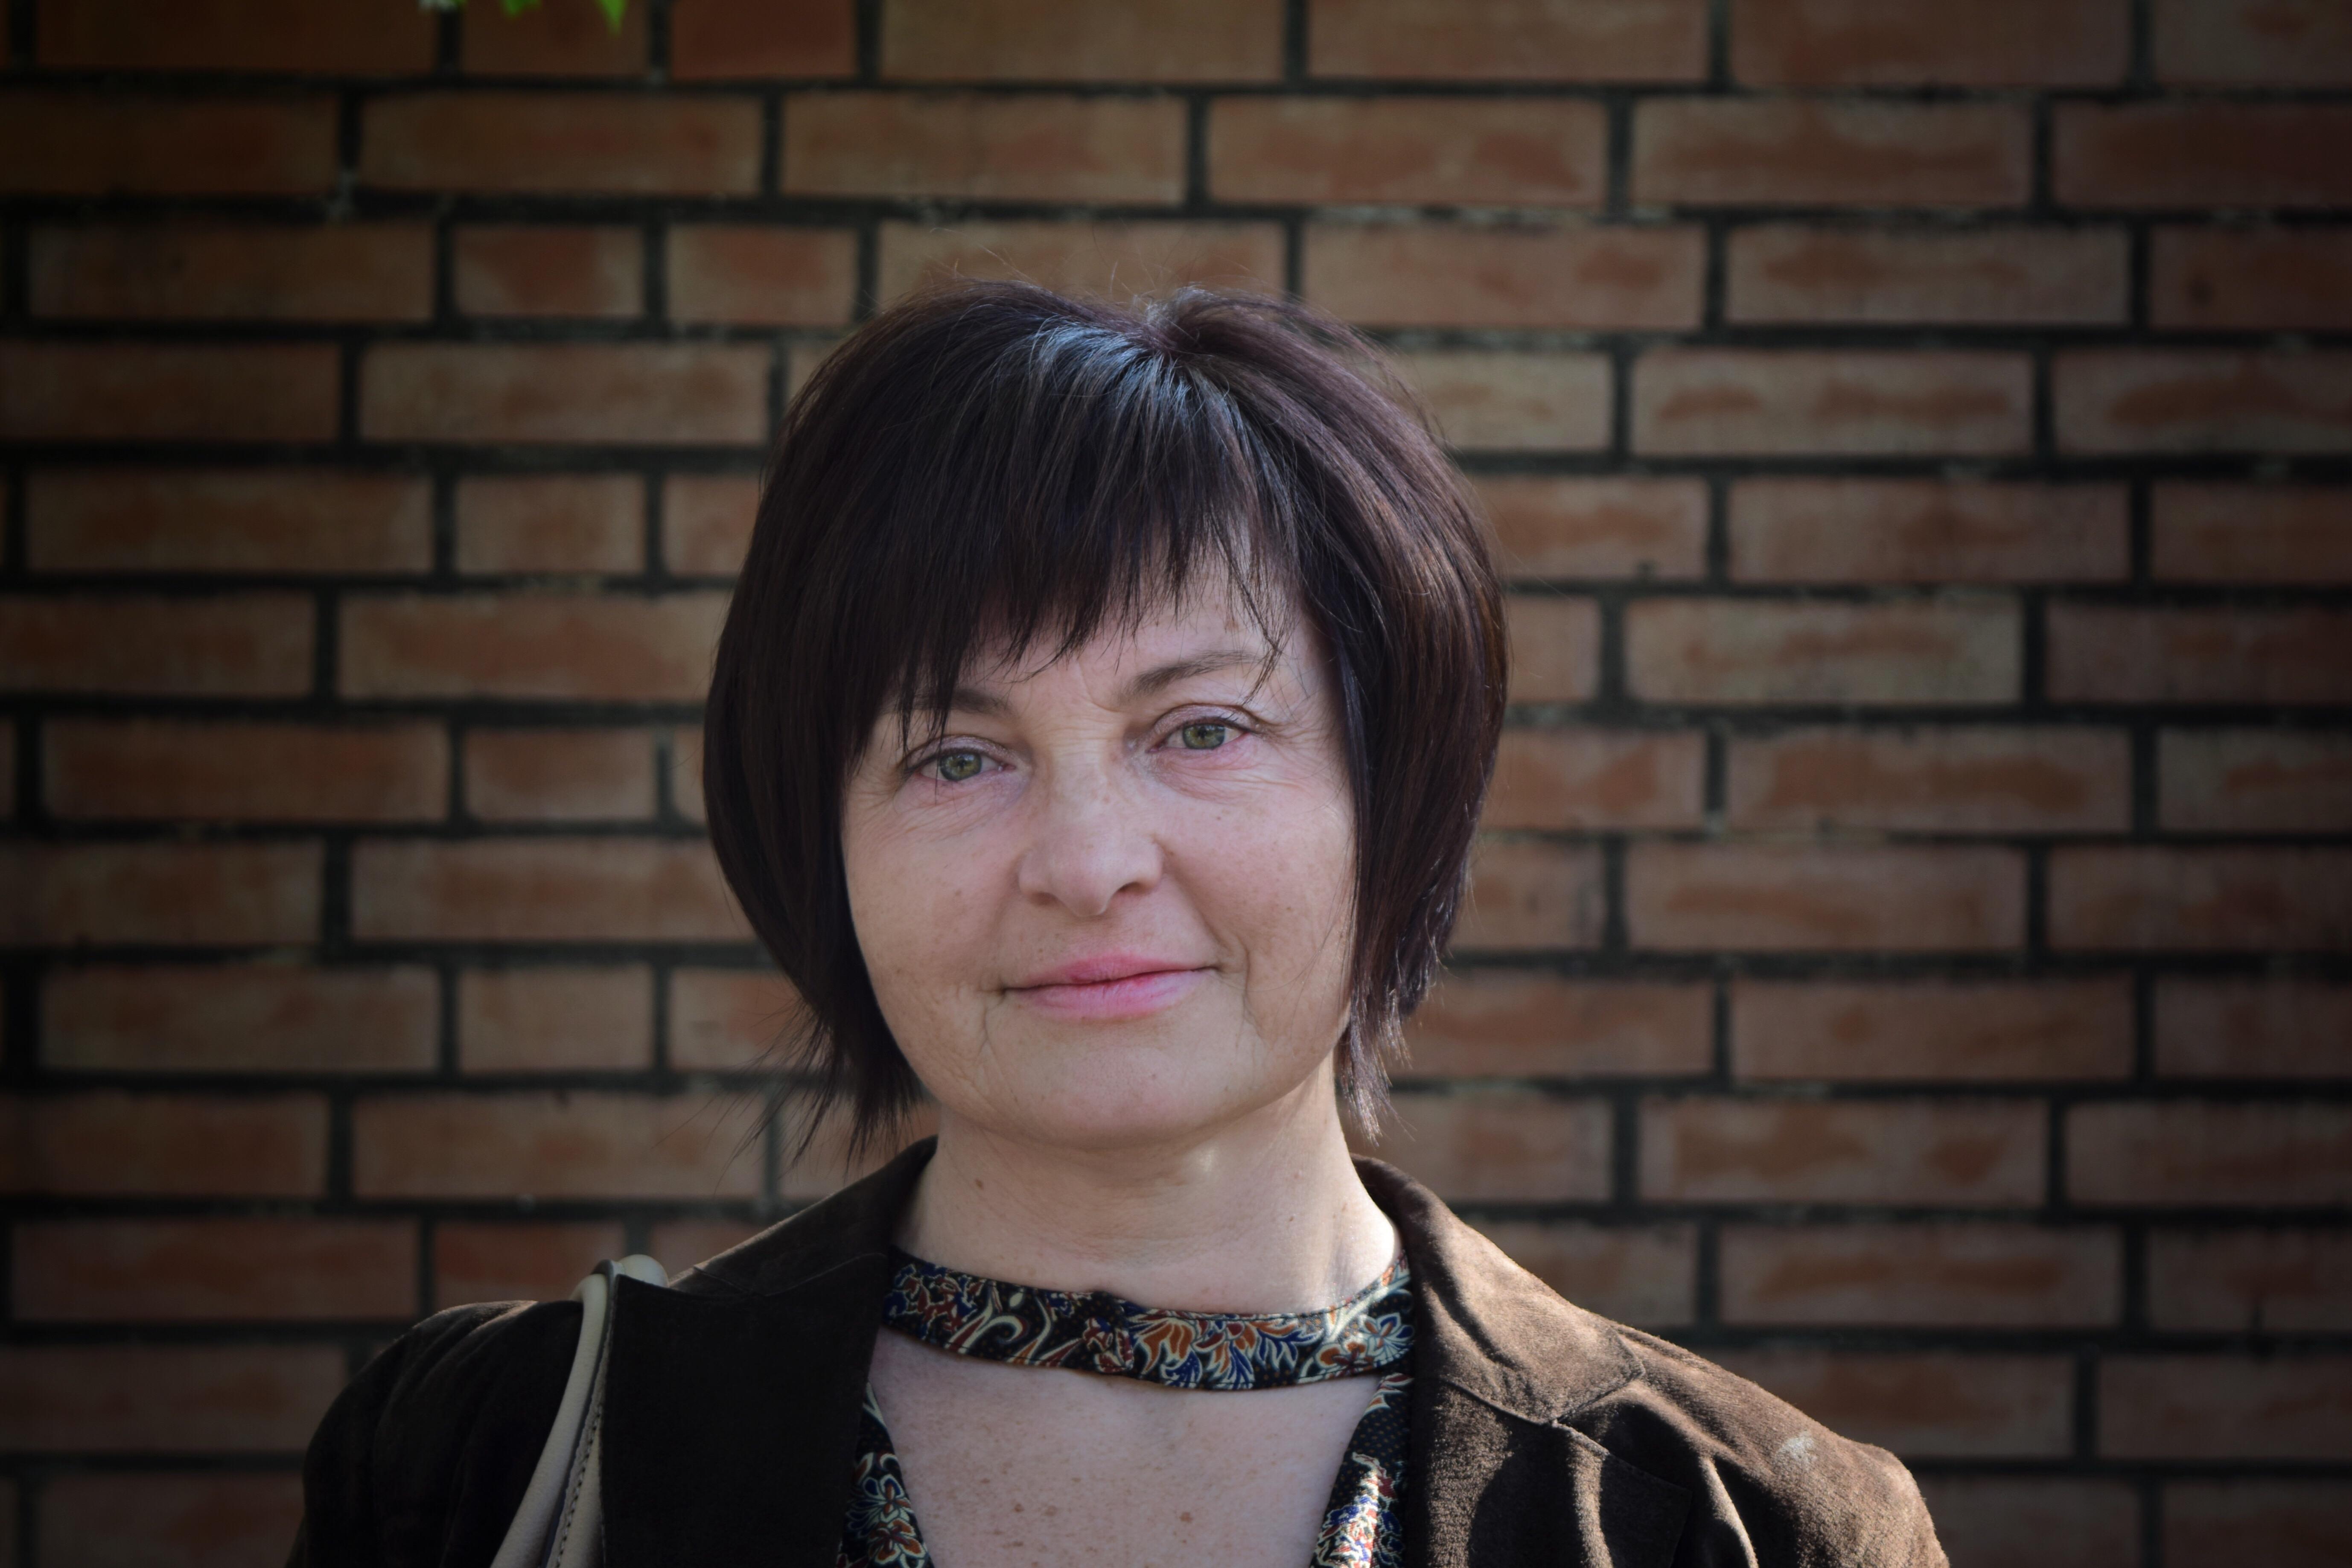 Interjú - Borbas-Aniko